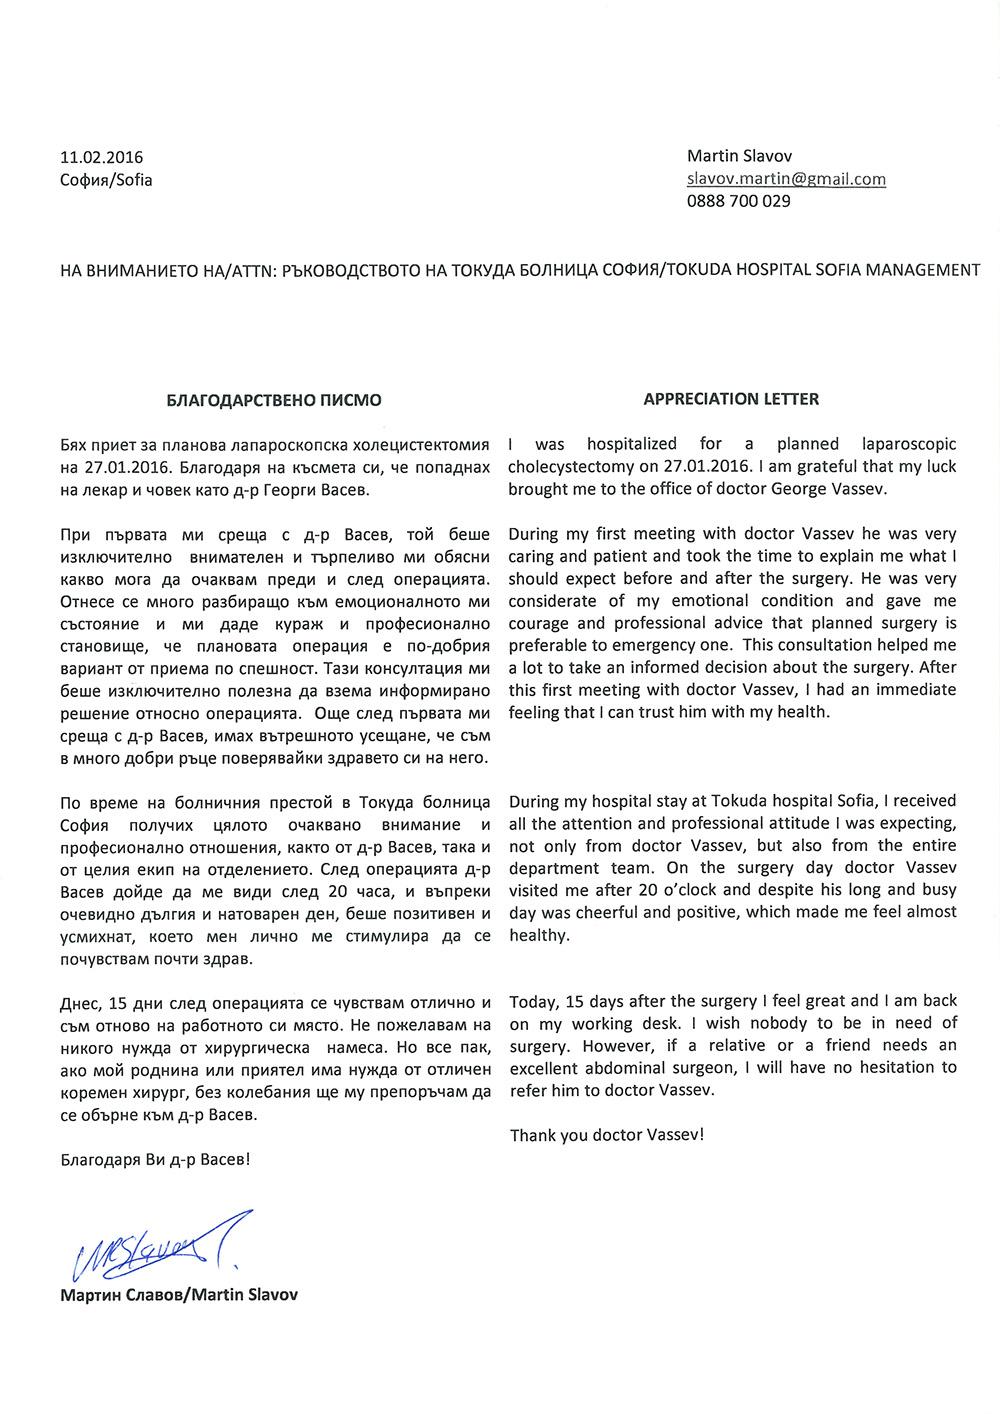 Patients reviews dr george vassev from martin slavov spiritdancerdesigns Choice Image